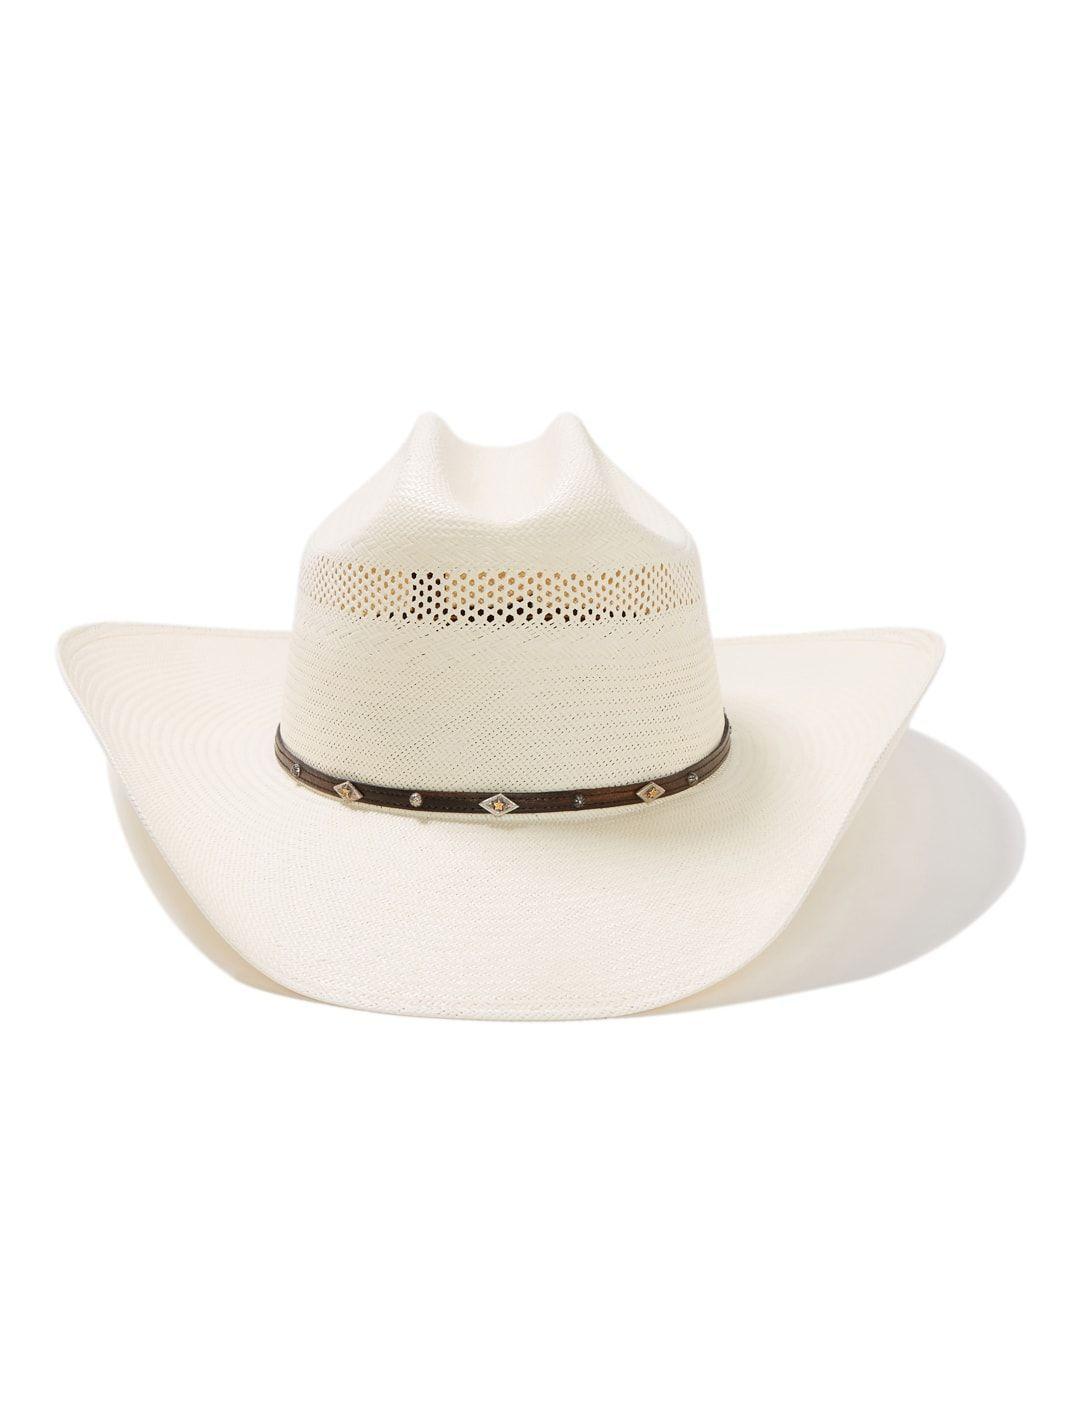 Stetson Lobo 10X Straw Cowboy Hat Item SSLOBO3042 49ac43e98bd